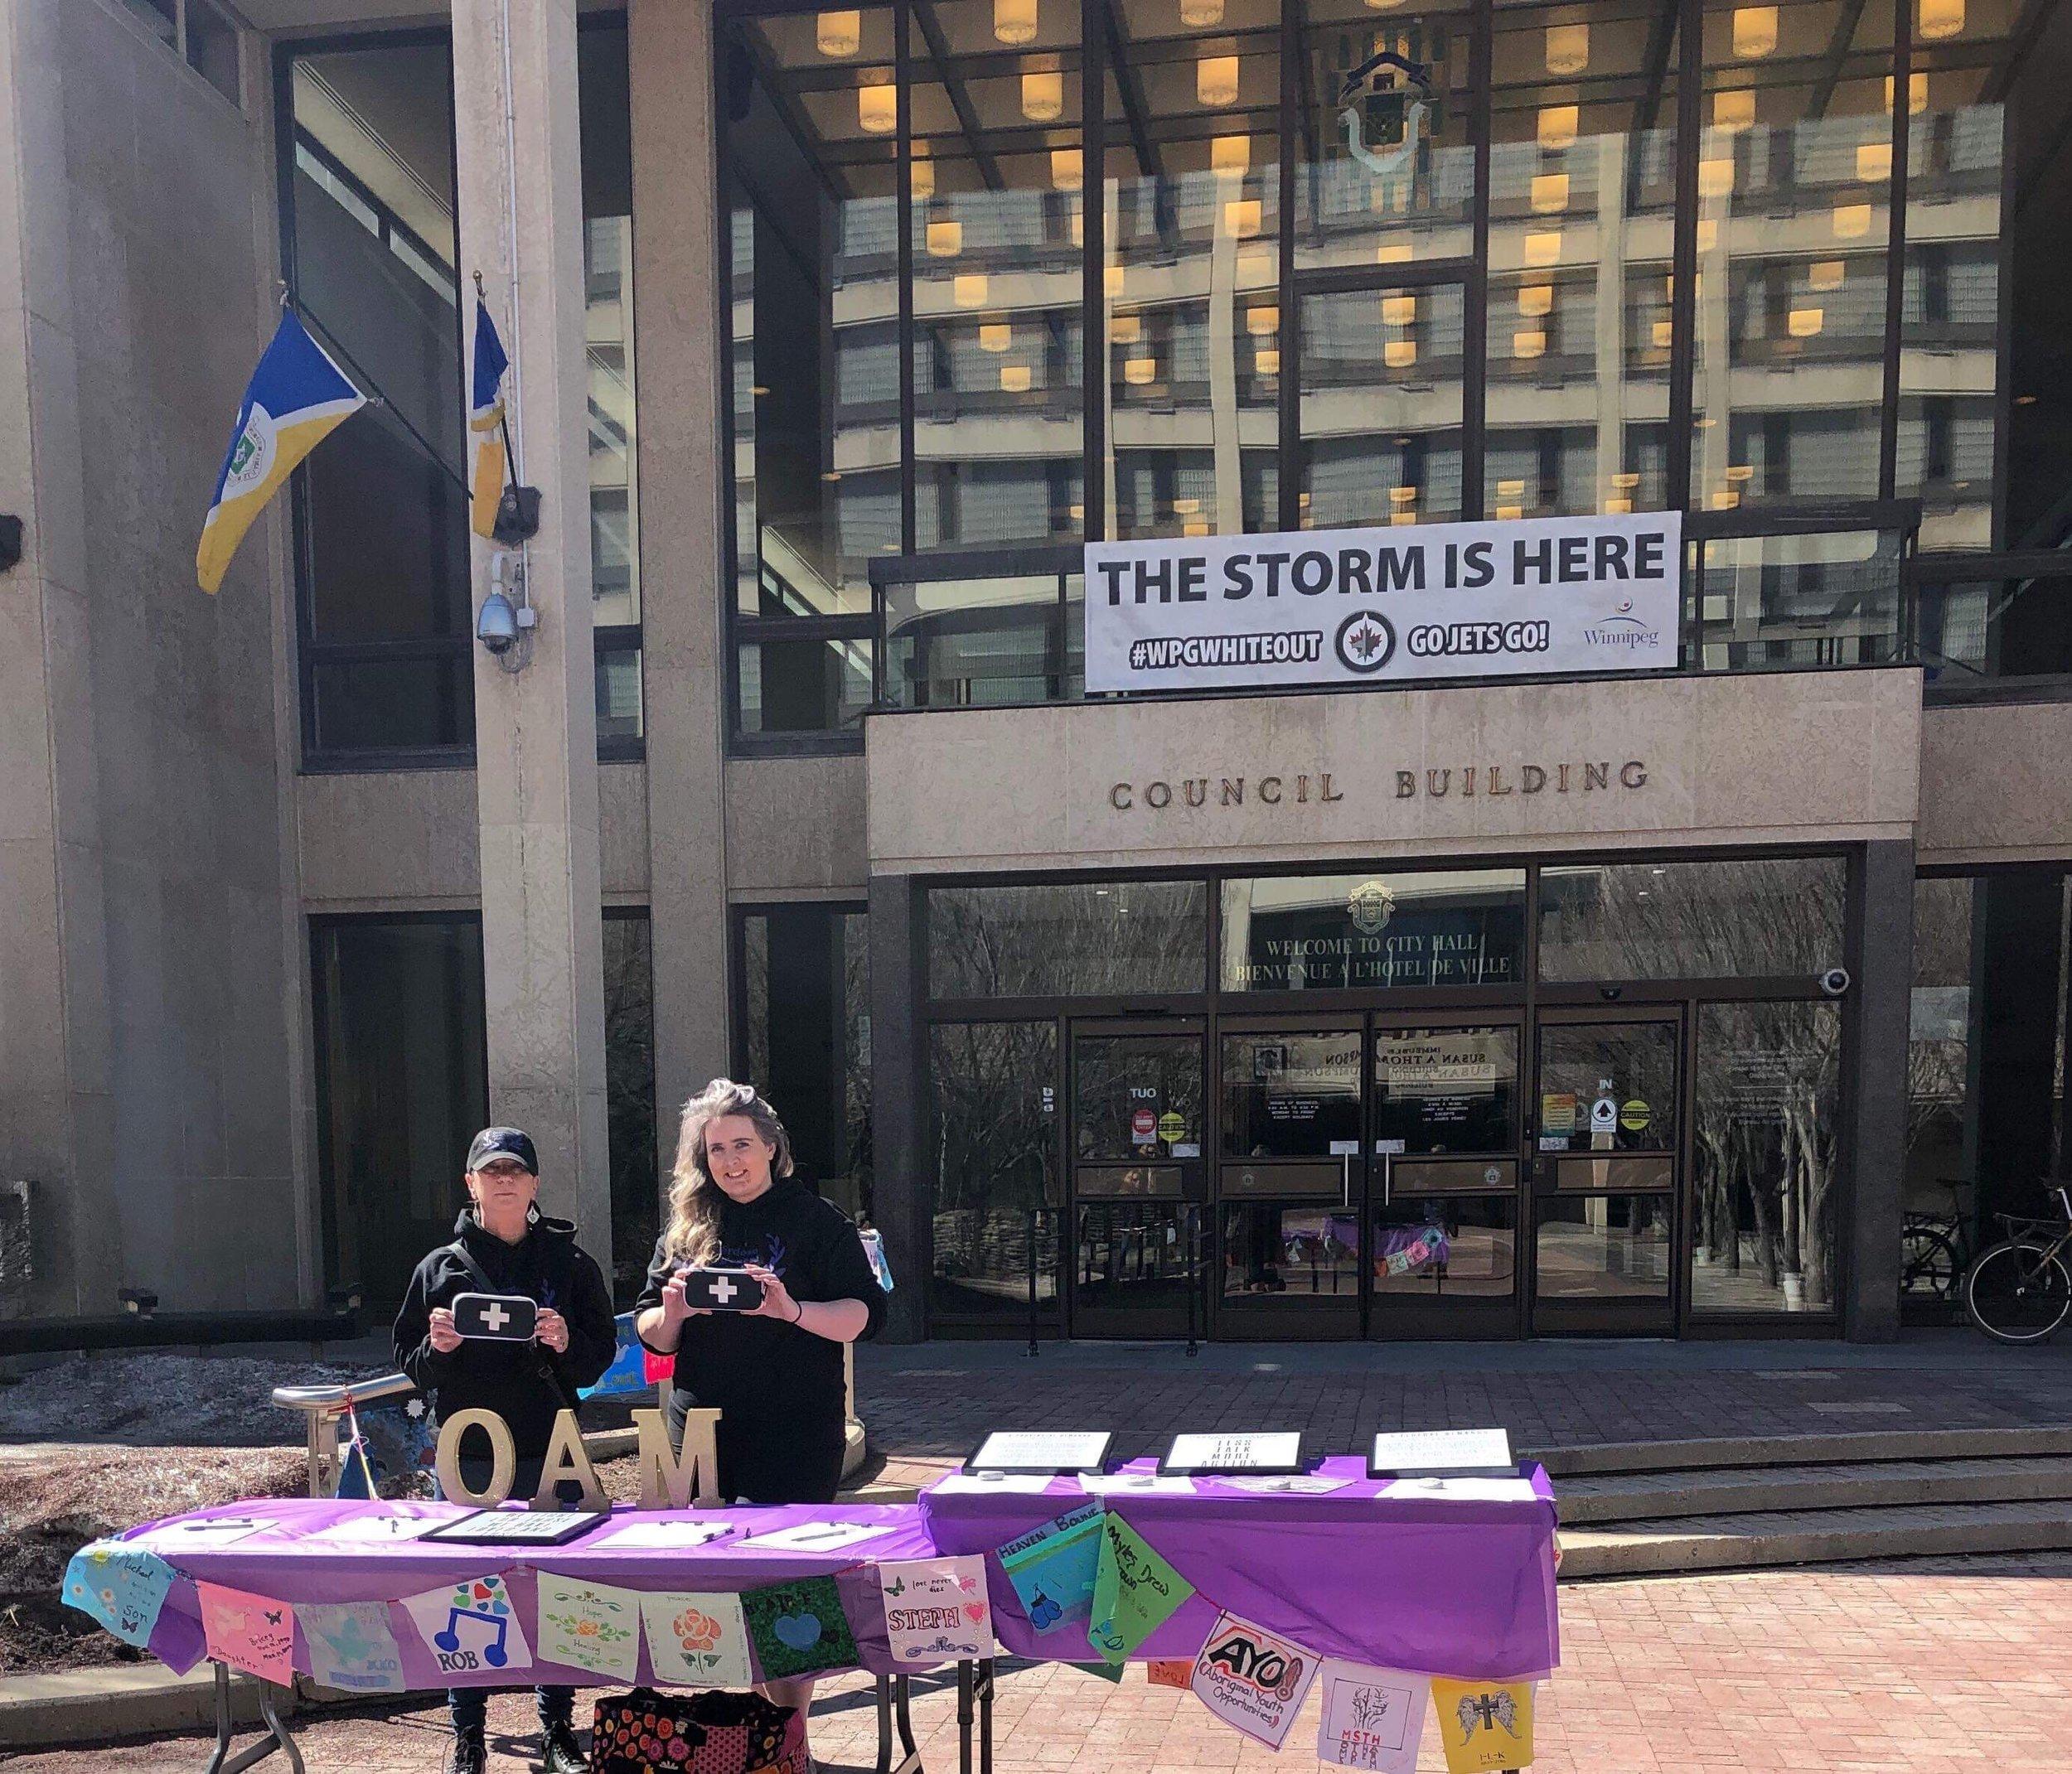 2019-04-16 Day of Action Winnipeg (2).JPG